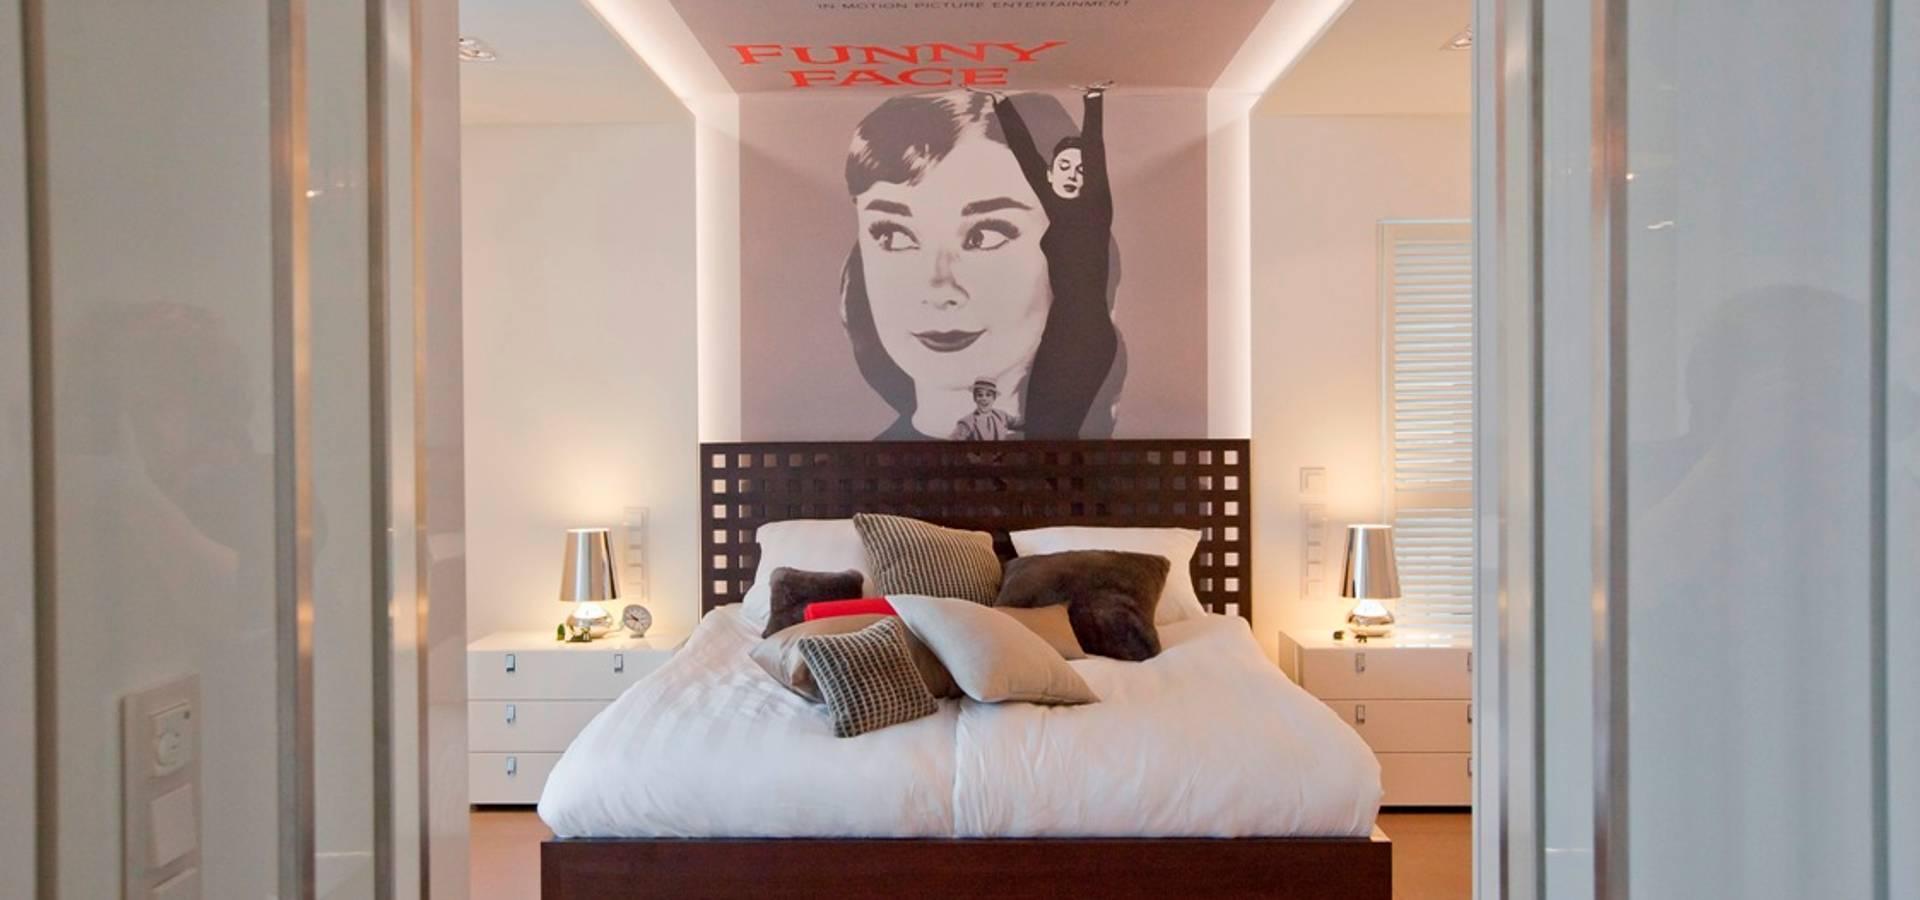 kern design innenarchitekten in frankfurt am main homify. Black Bedroom Furniture Sets. Home Design Ideas